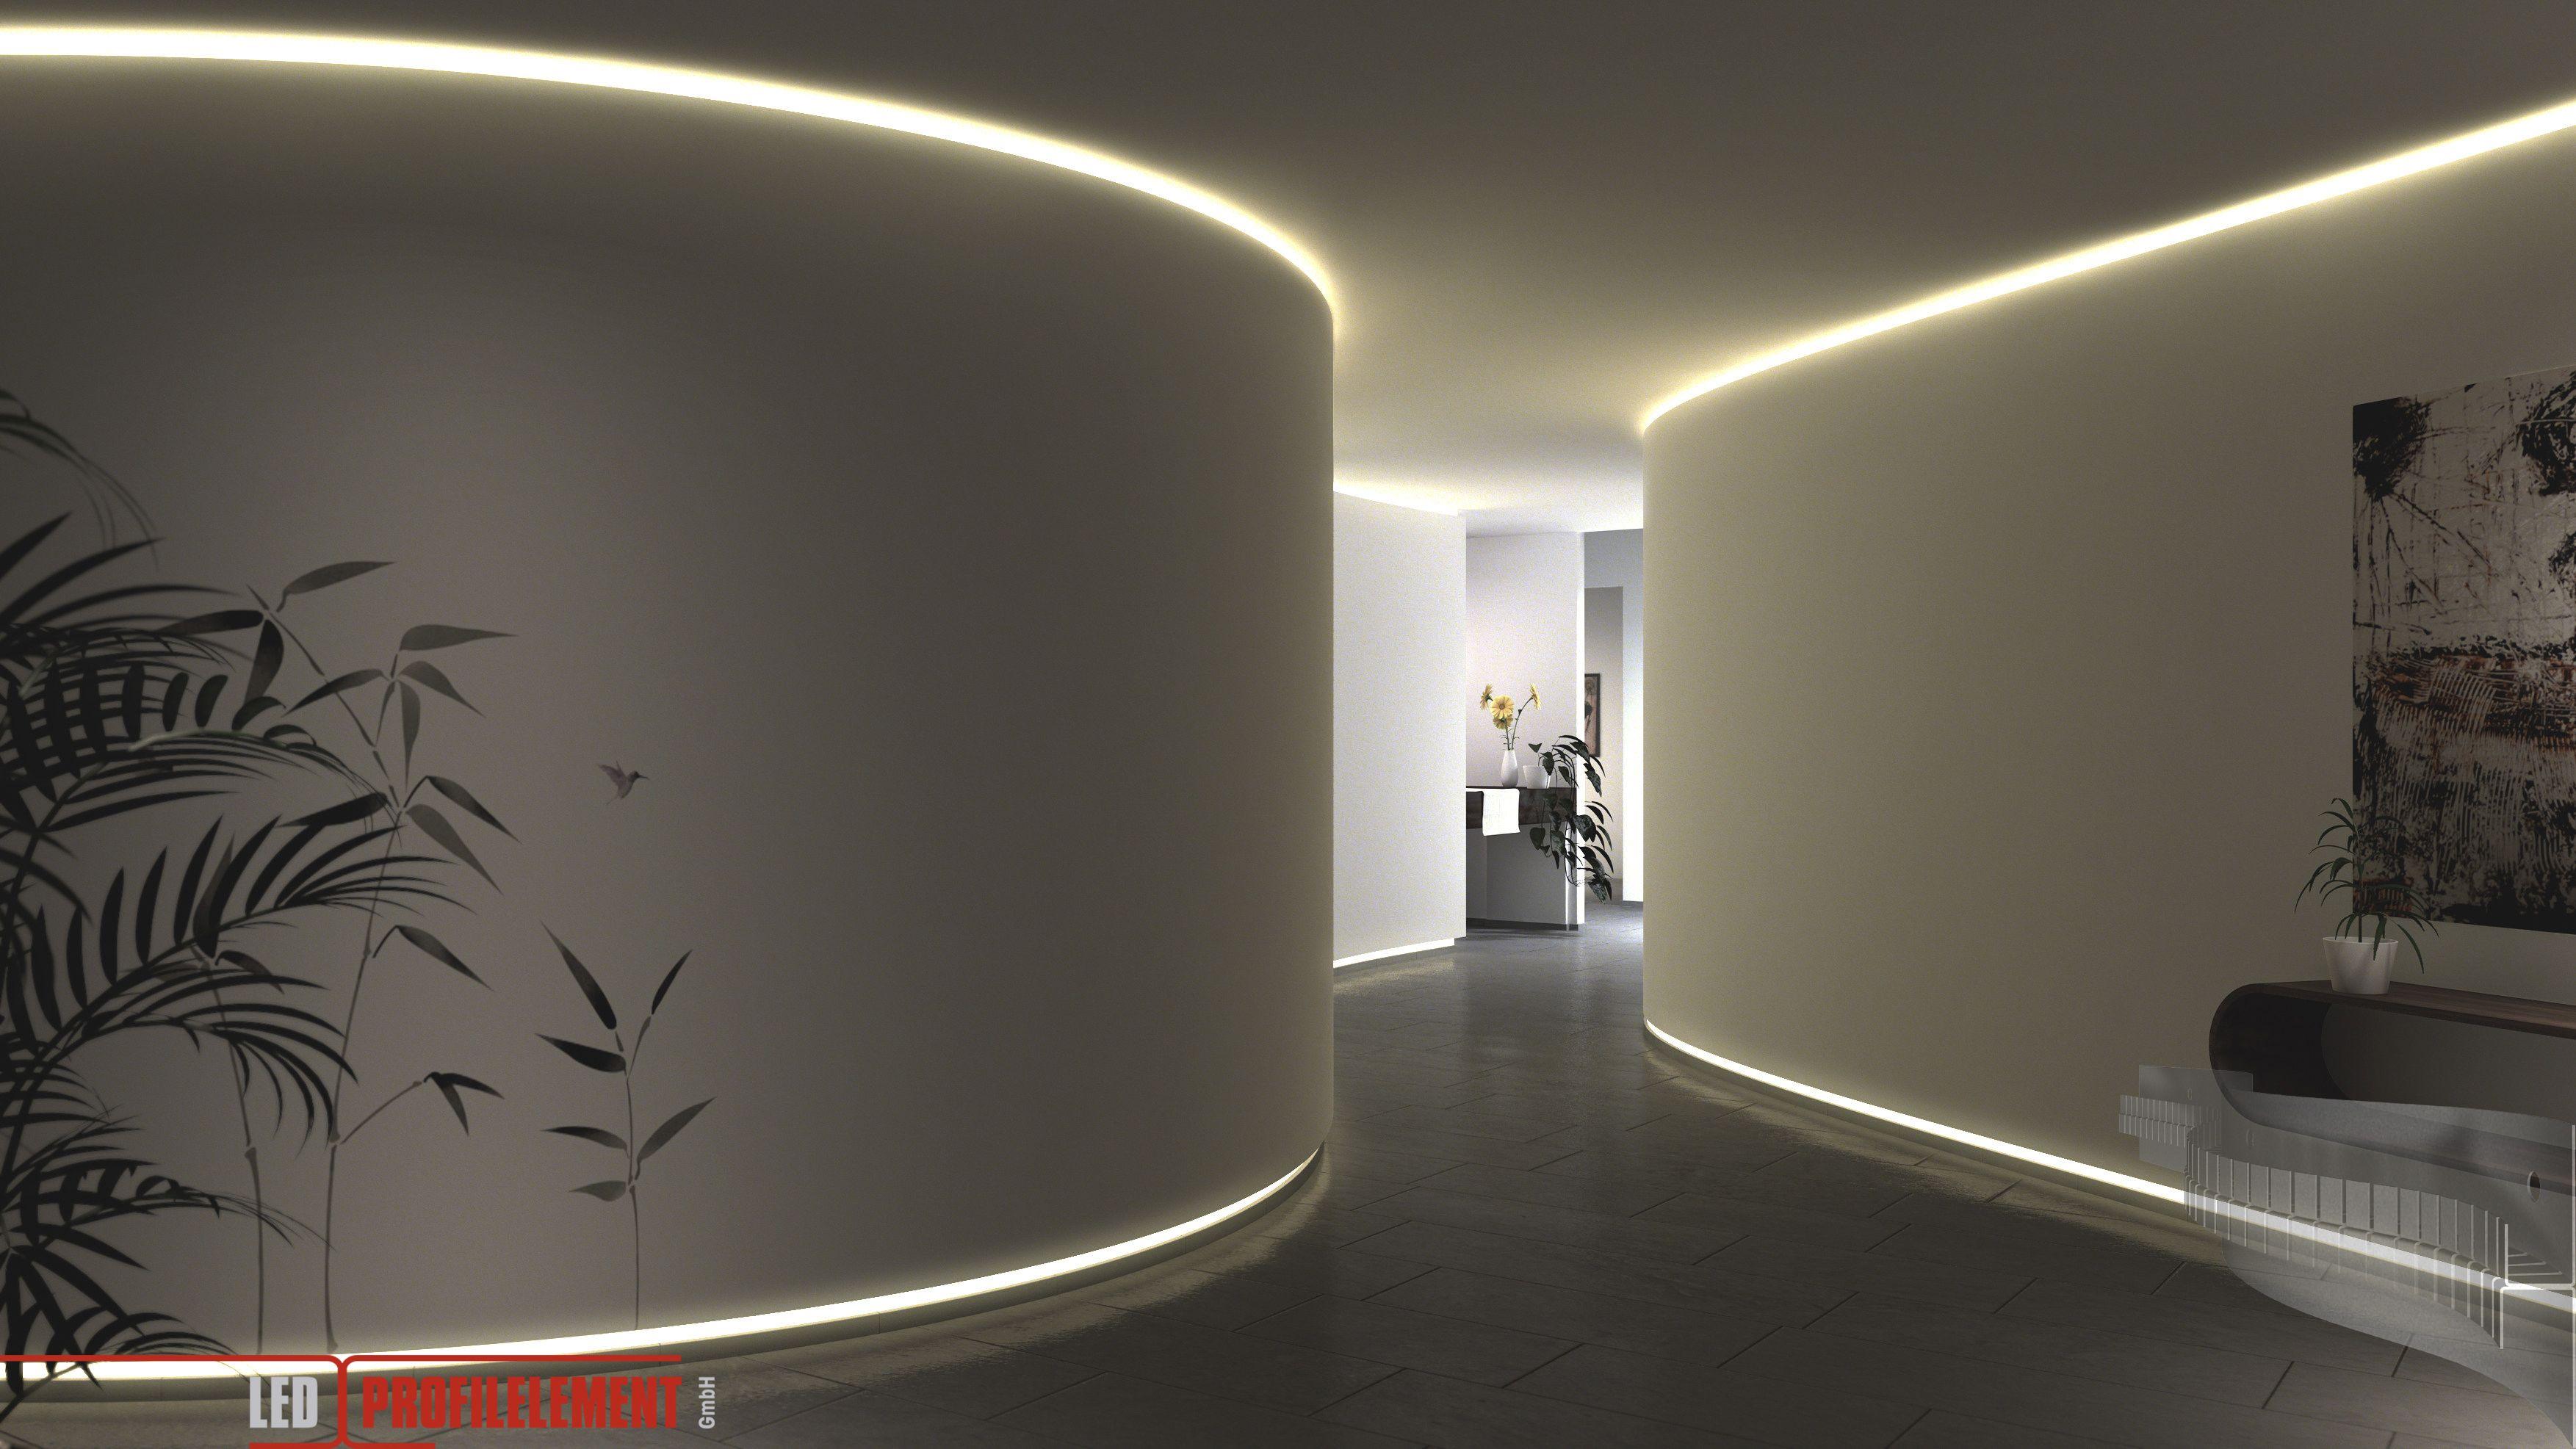 Cool Indirekte Beleuchtung Tolle Variante f r gro e R ume und Eingangshallen ledprofilelement